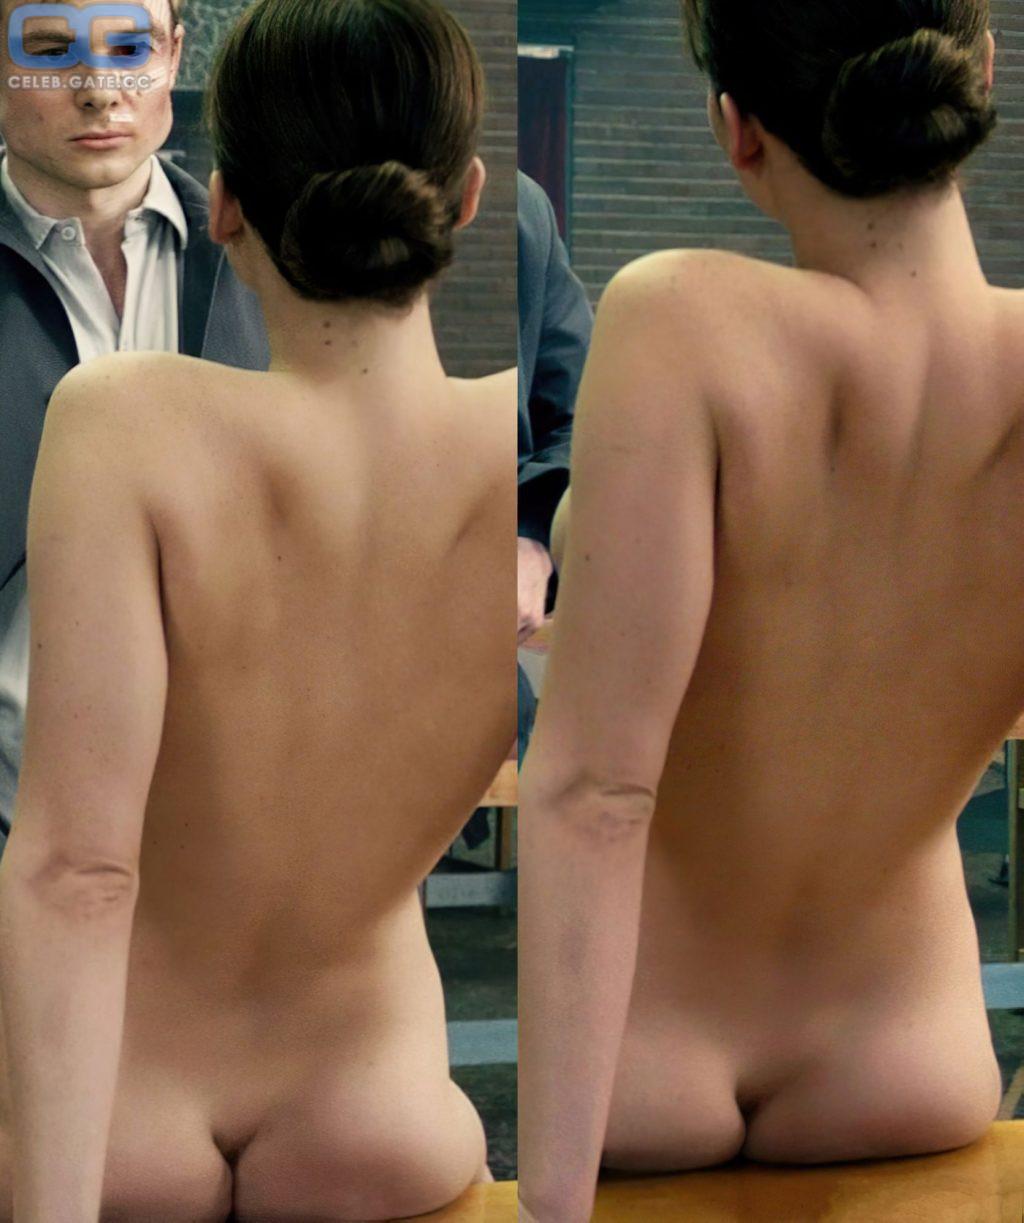 Nackt in jennifer lawrence Celebrities